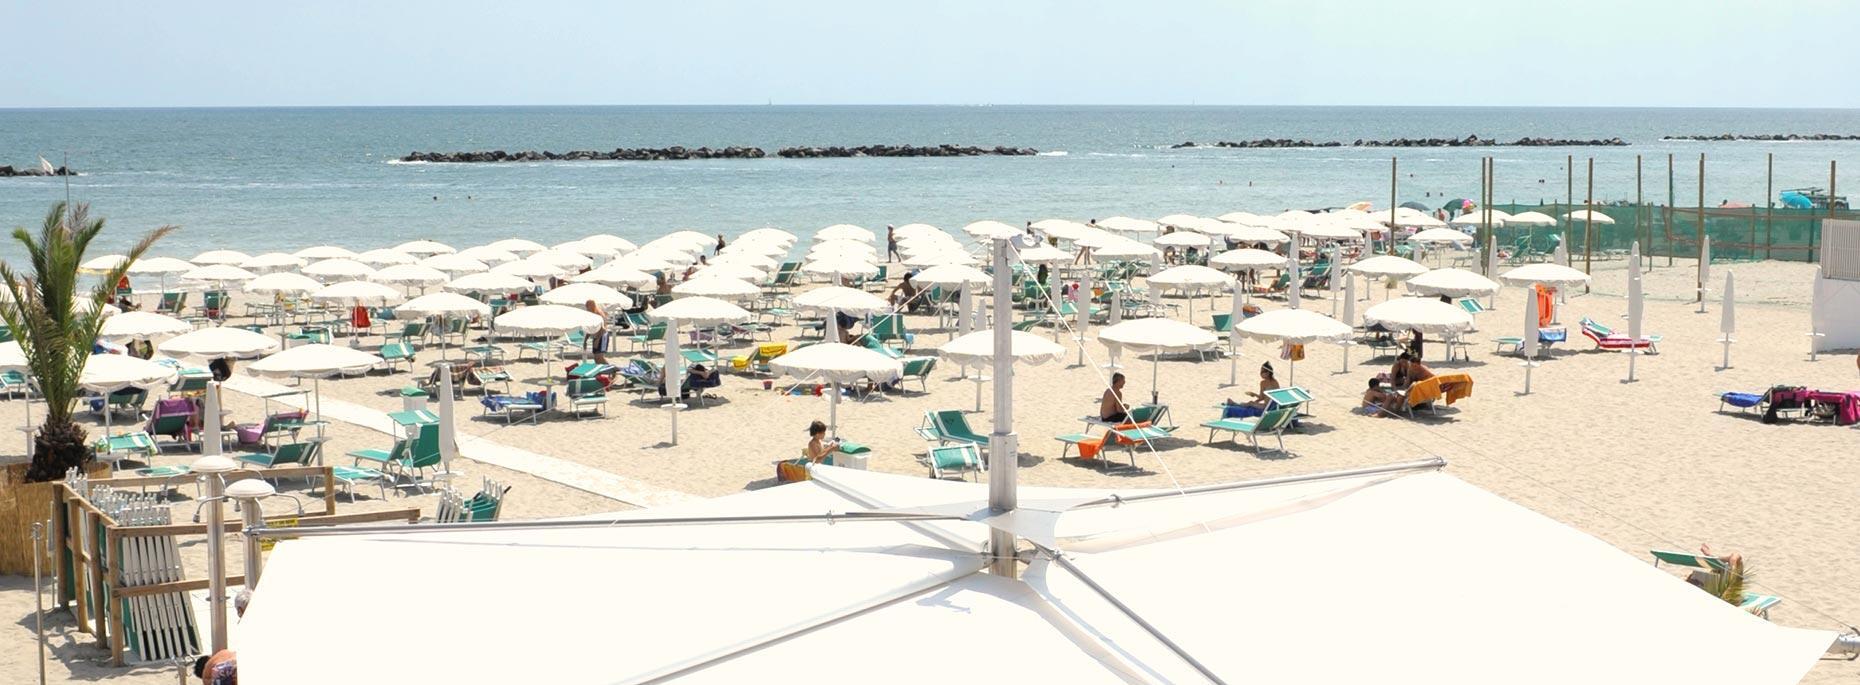 playadoradaresidence it spiaggia 004